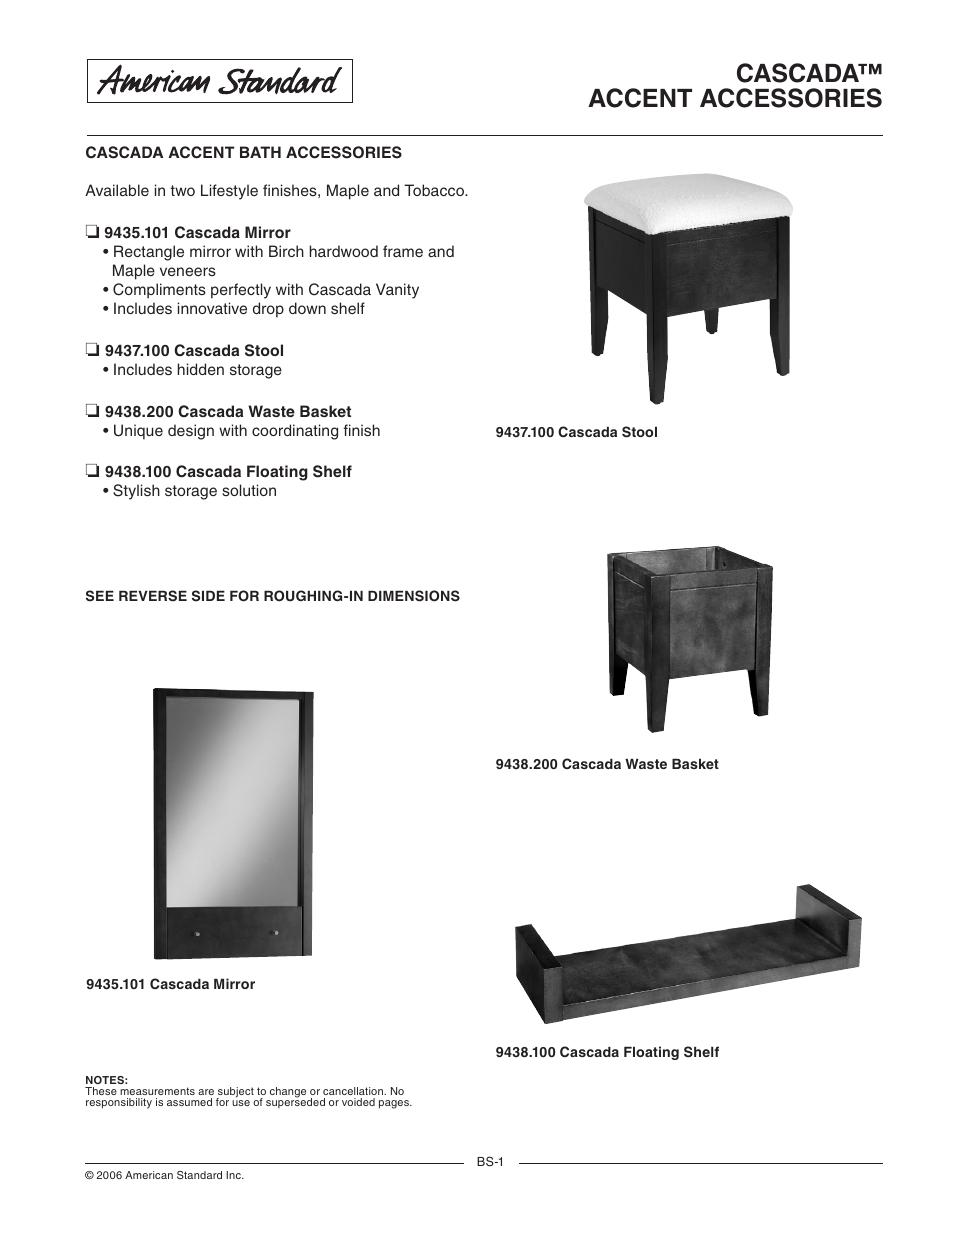 American Standard Cascada Accent Bath Accessories 9437.100 User ...